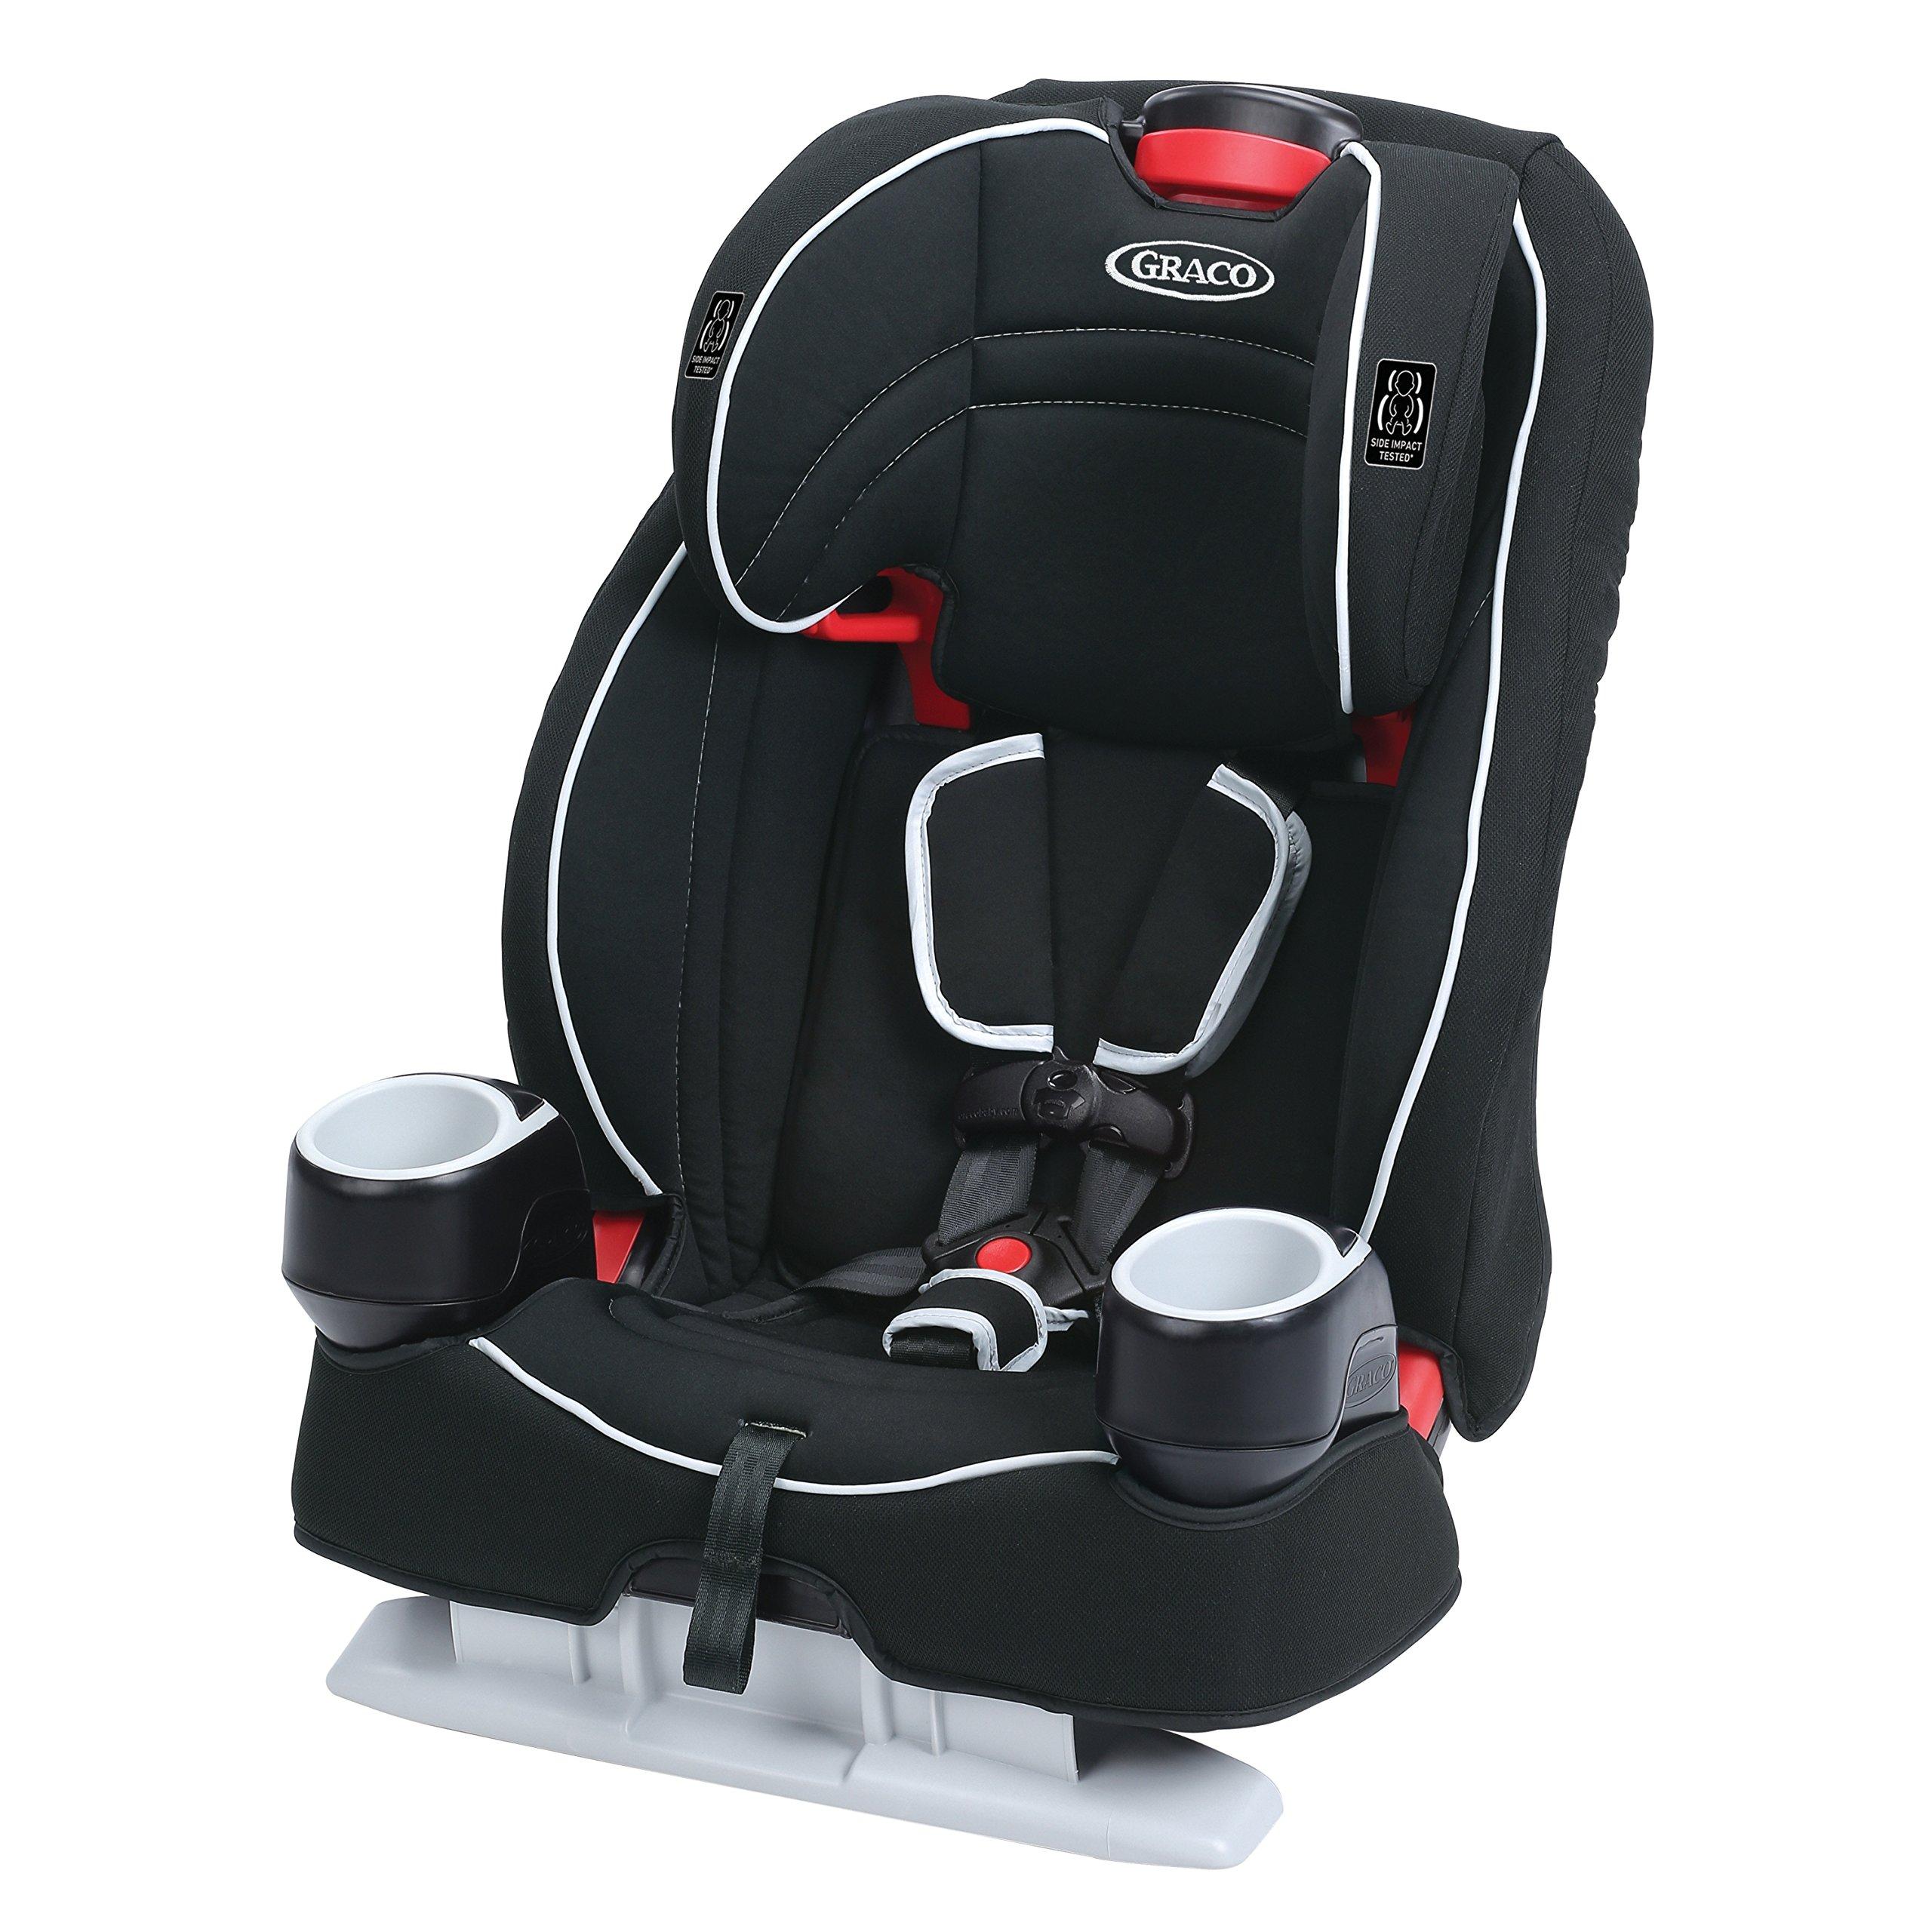 Graco Atlas 65 2 In 1 Harness Booster Car Seat Glacier